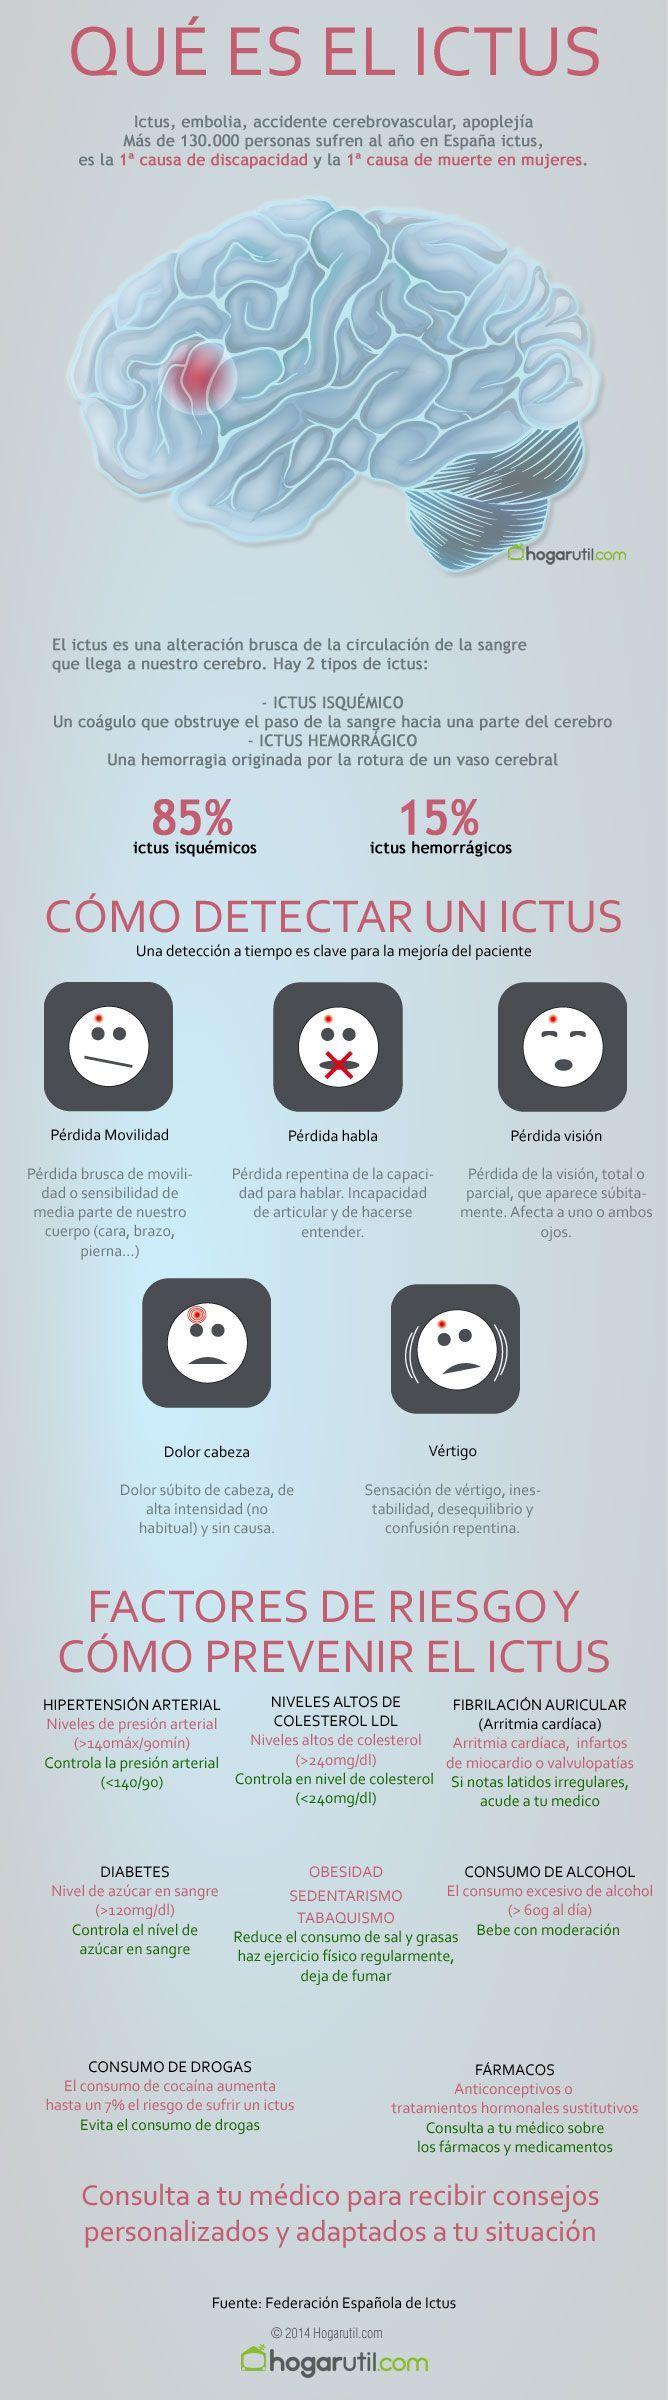 infografia-ictus.jpg